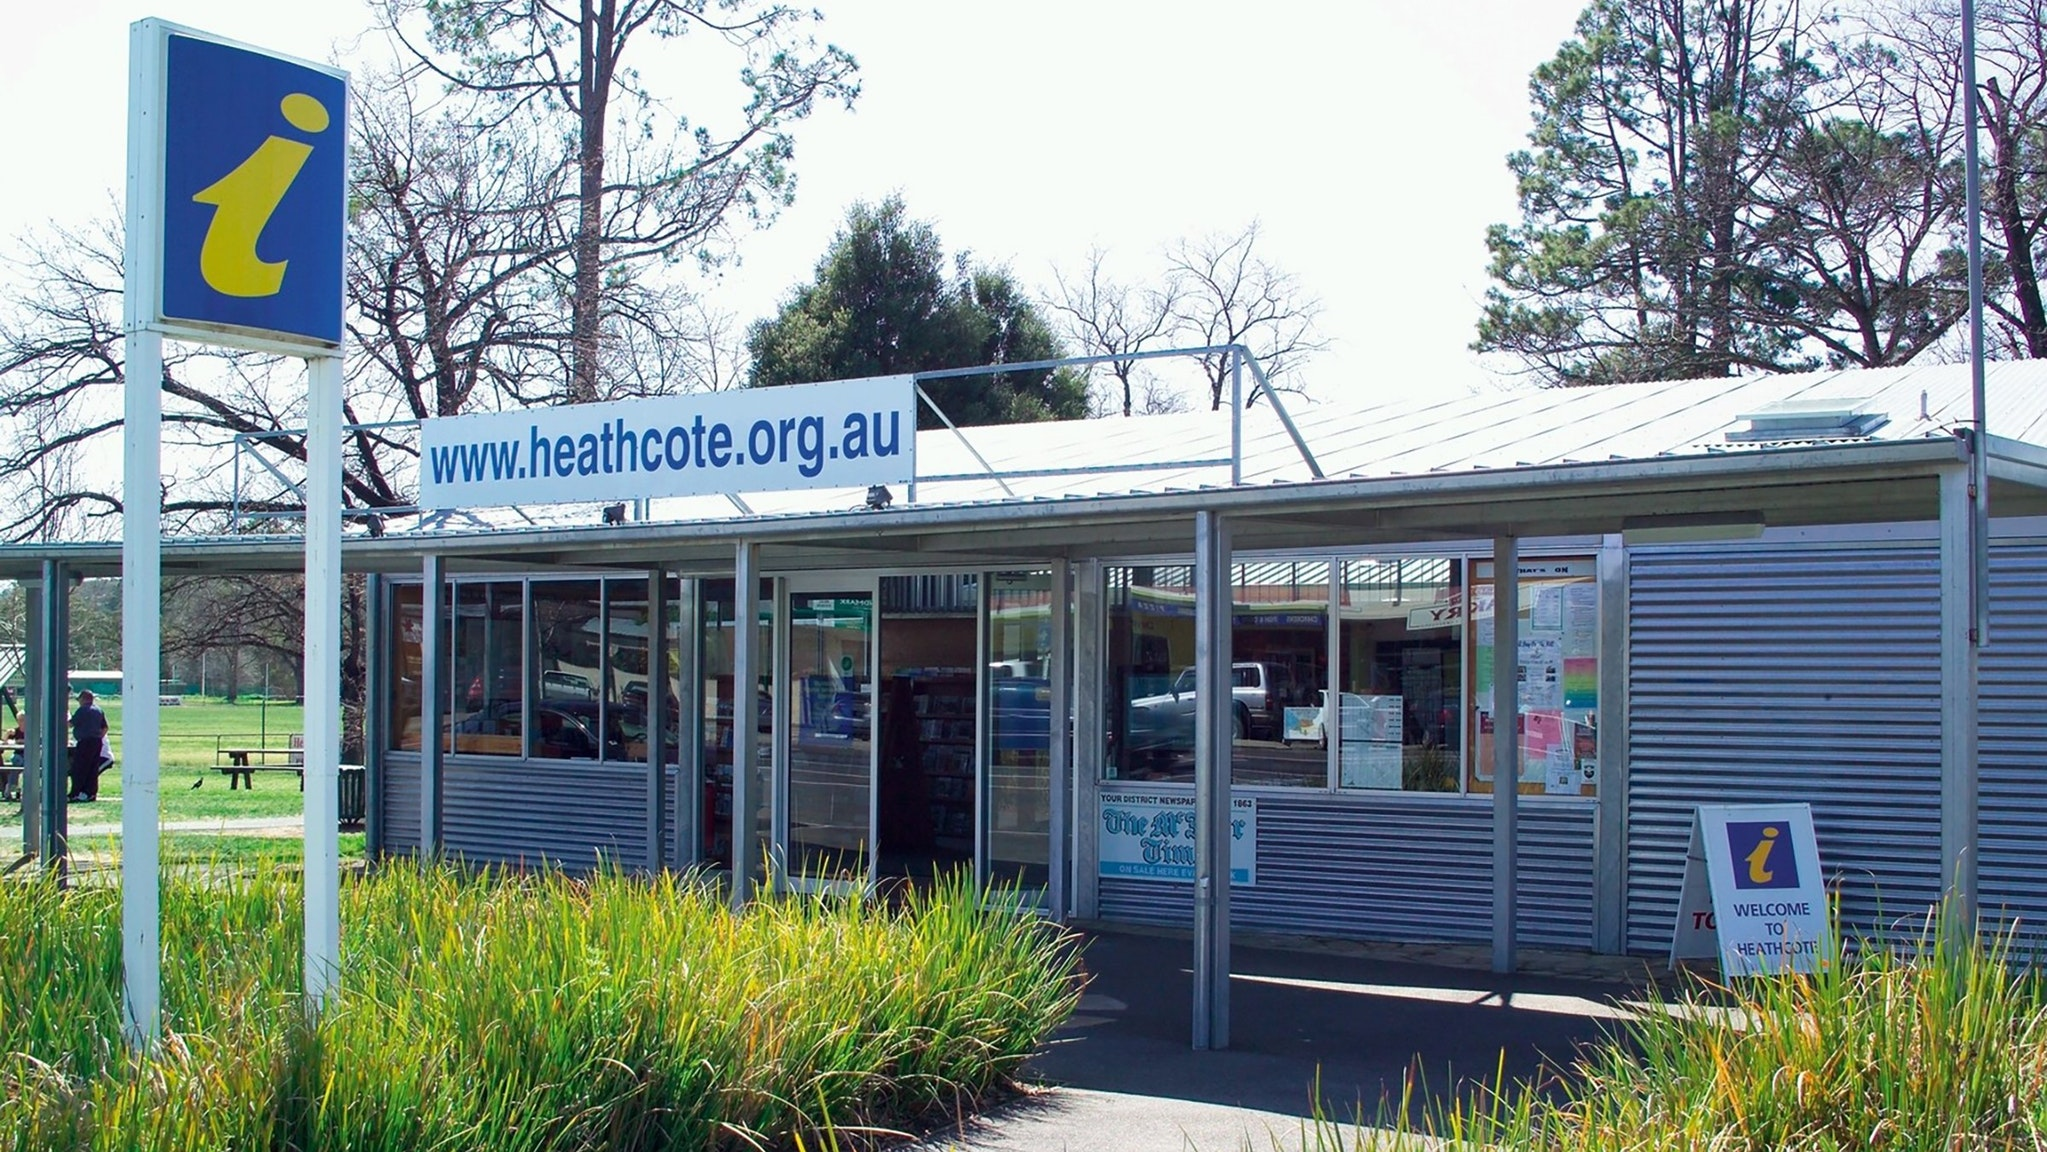 Heathcote Visitor Centre